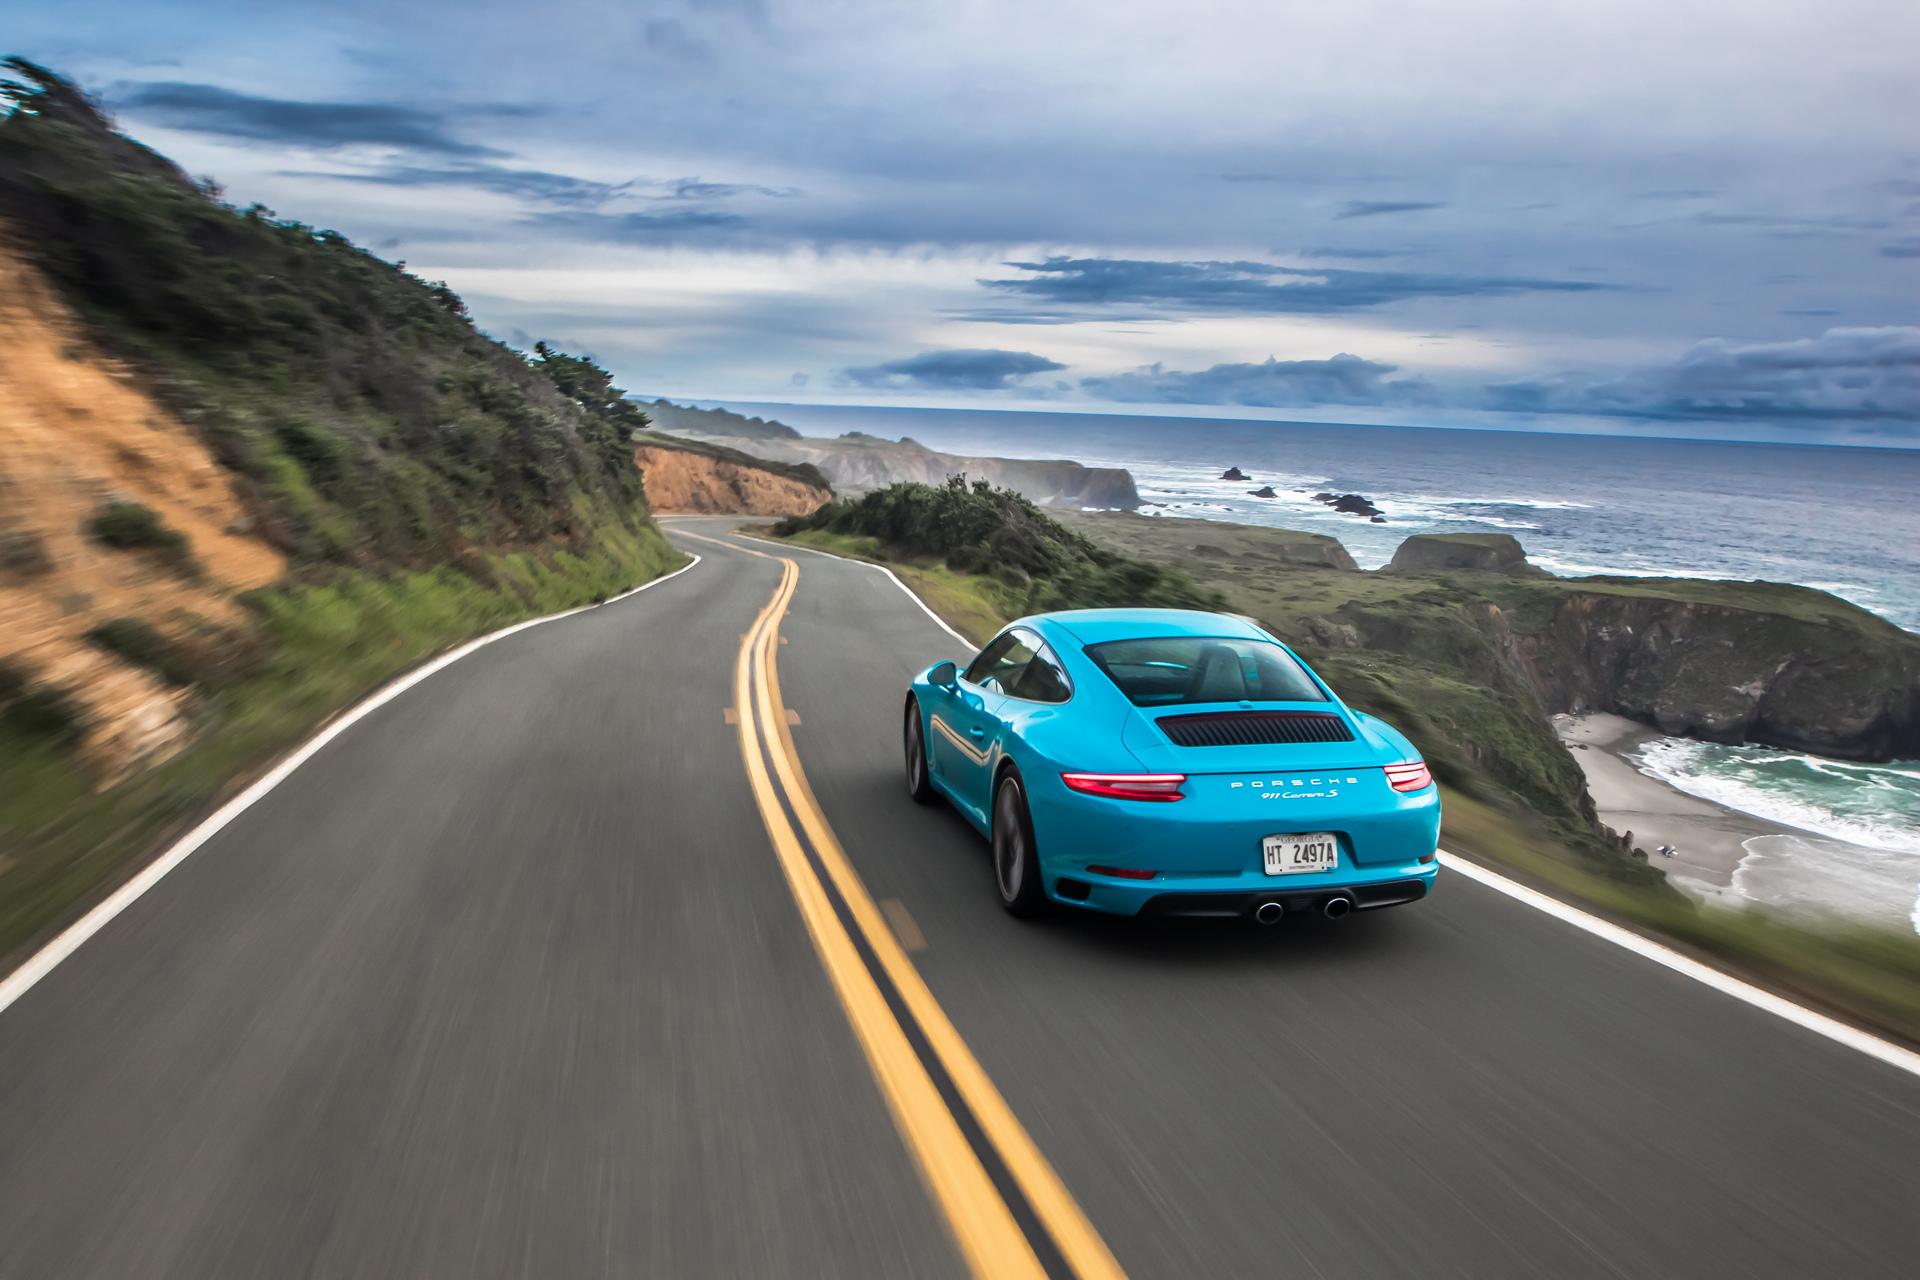 2017 Porsche 911 Carrera S © Dr. Ing. h.c. F. Porsche AG